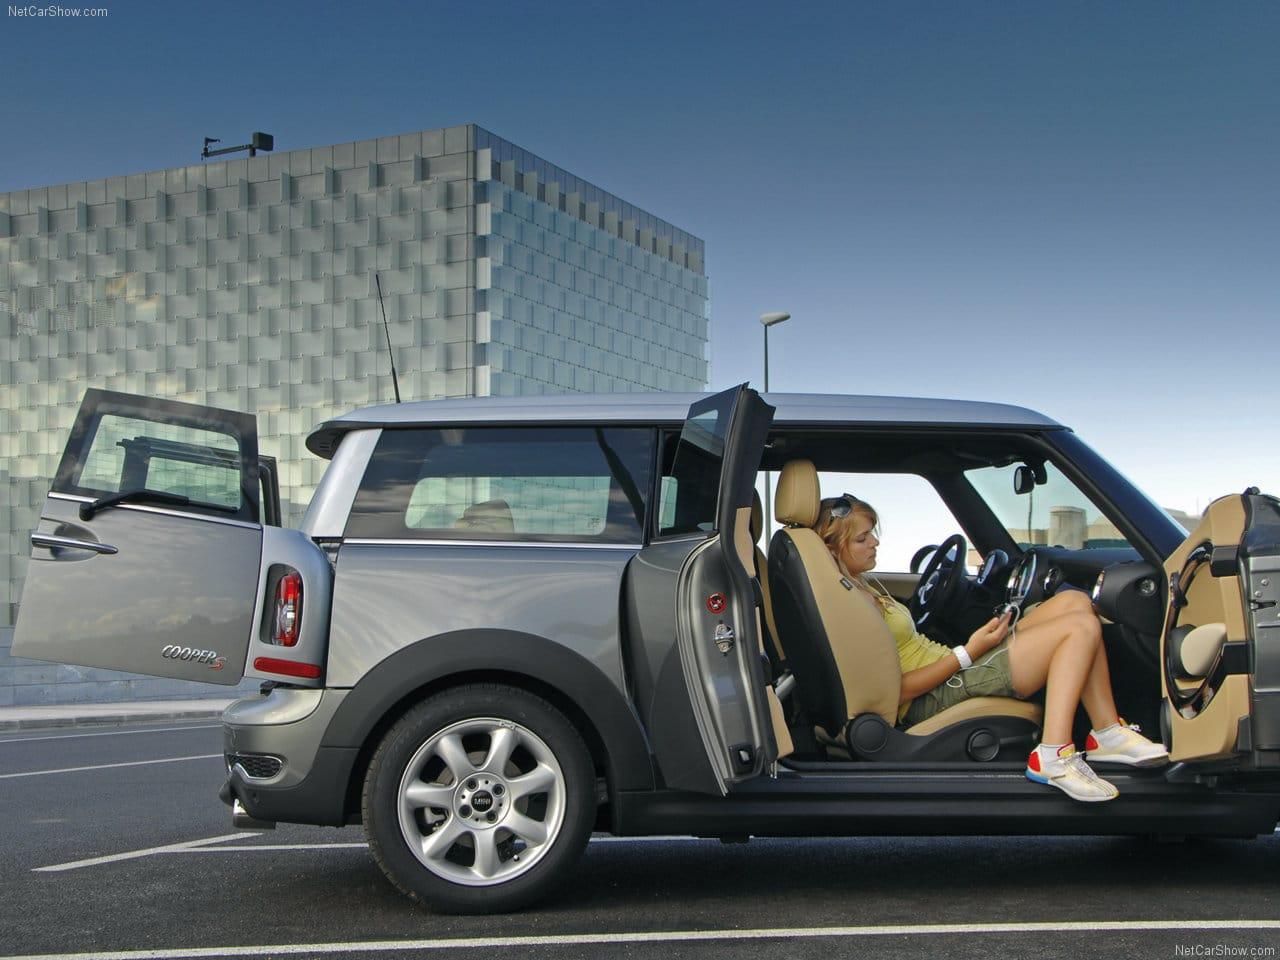 MINI, Rover Mini, Austin Mini, MINI Clubman, Clubman, featured, MINI Cooper, MINI Cooper D, classic car, retro car, motoring, automotive, featured, not2grand, not2grand.co.uk, carandclassic, carandclassic.co.uk